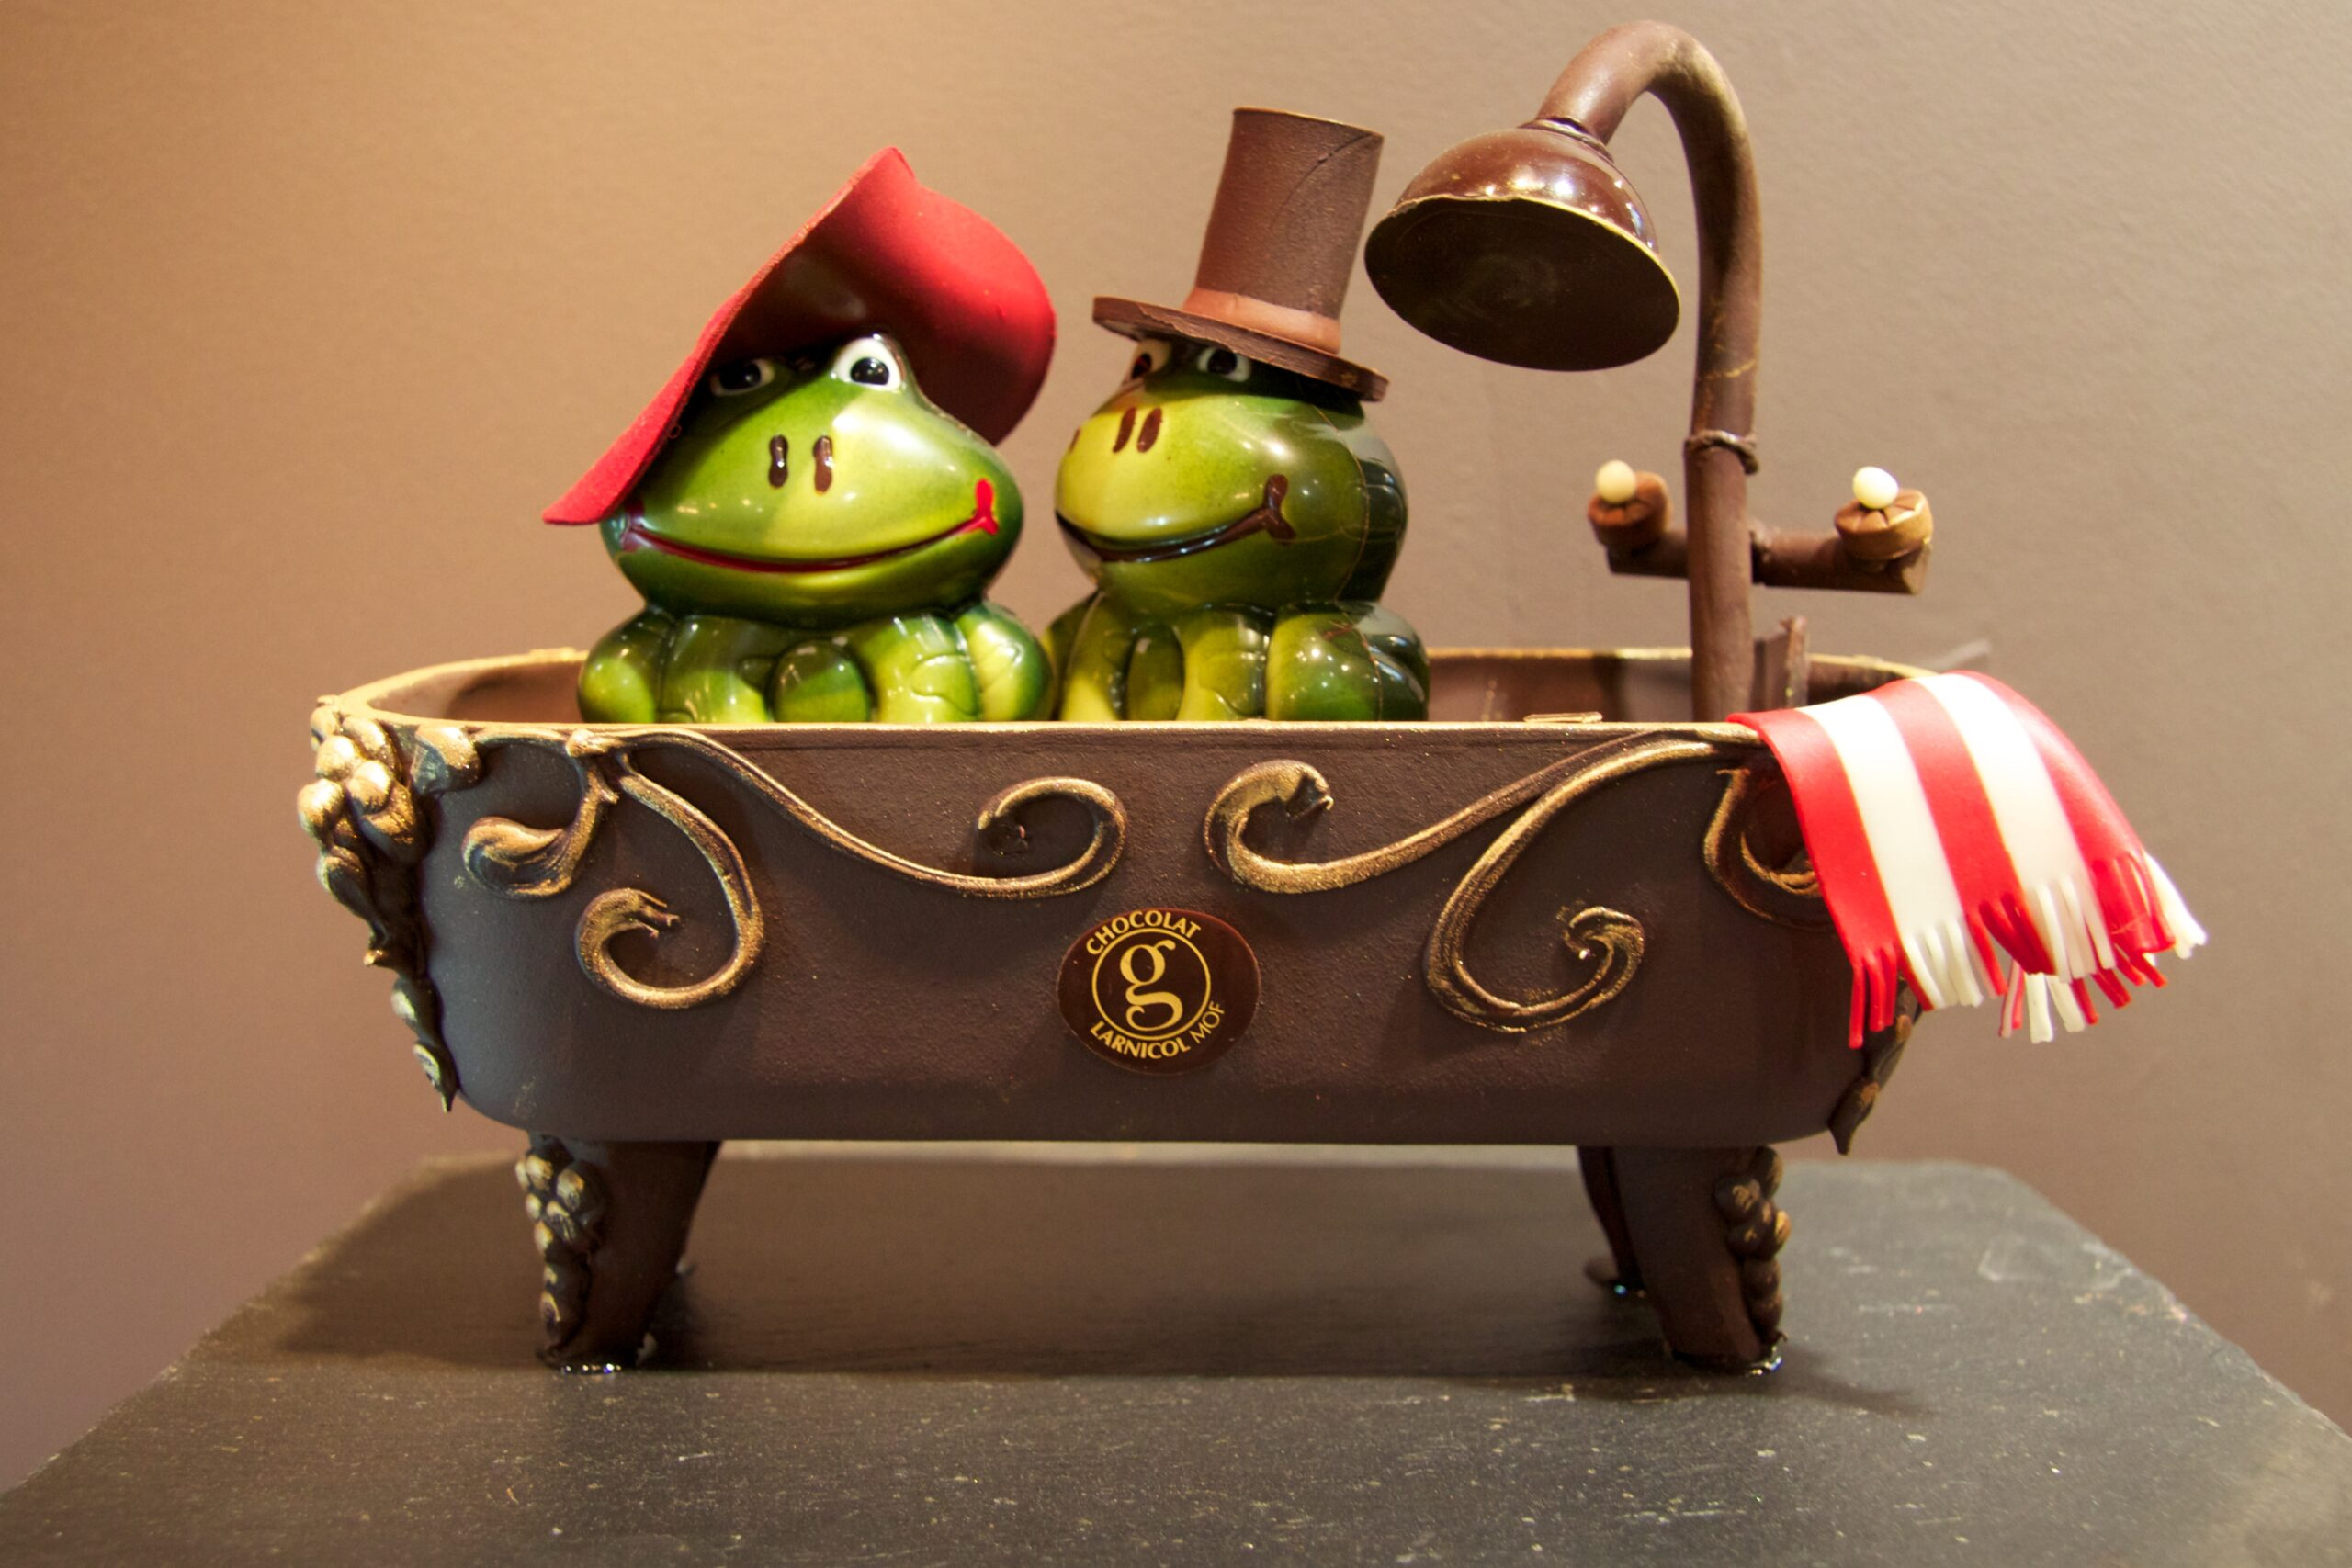 Creative chocolate sculptures